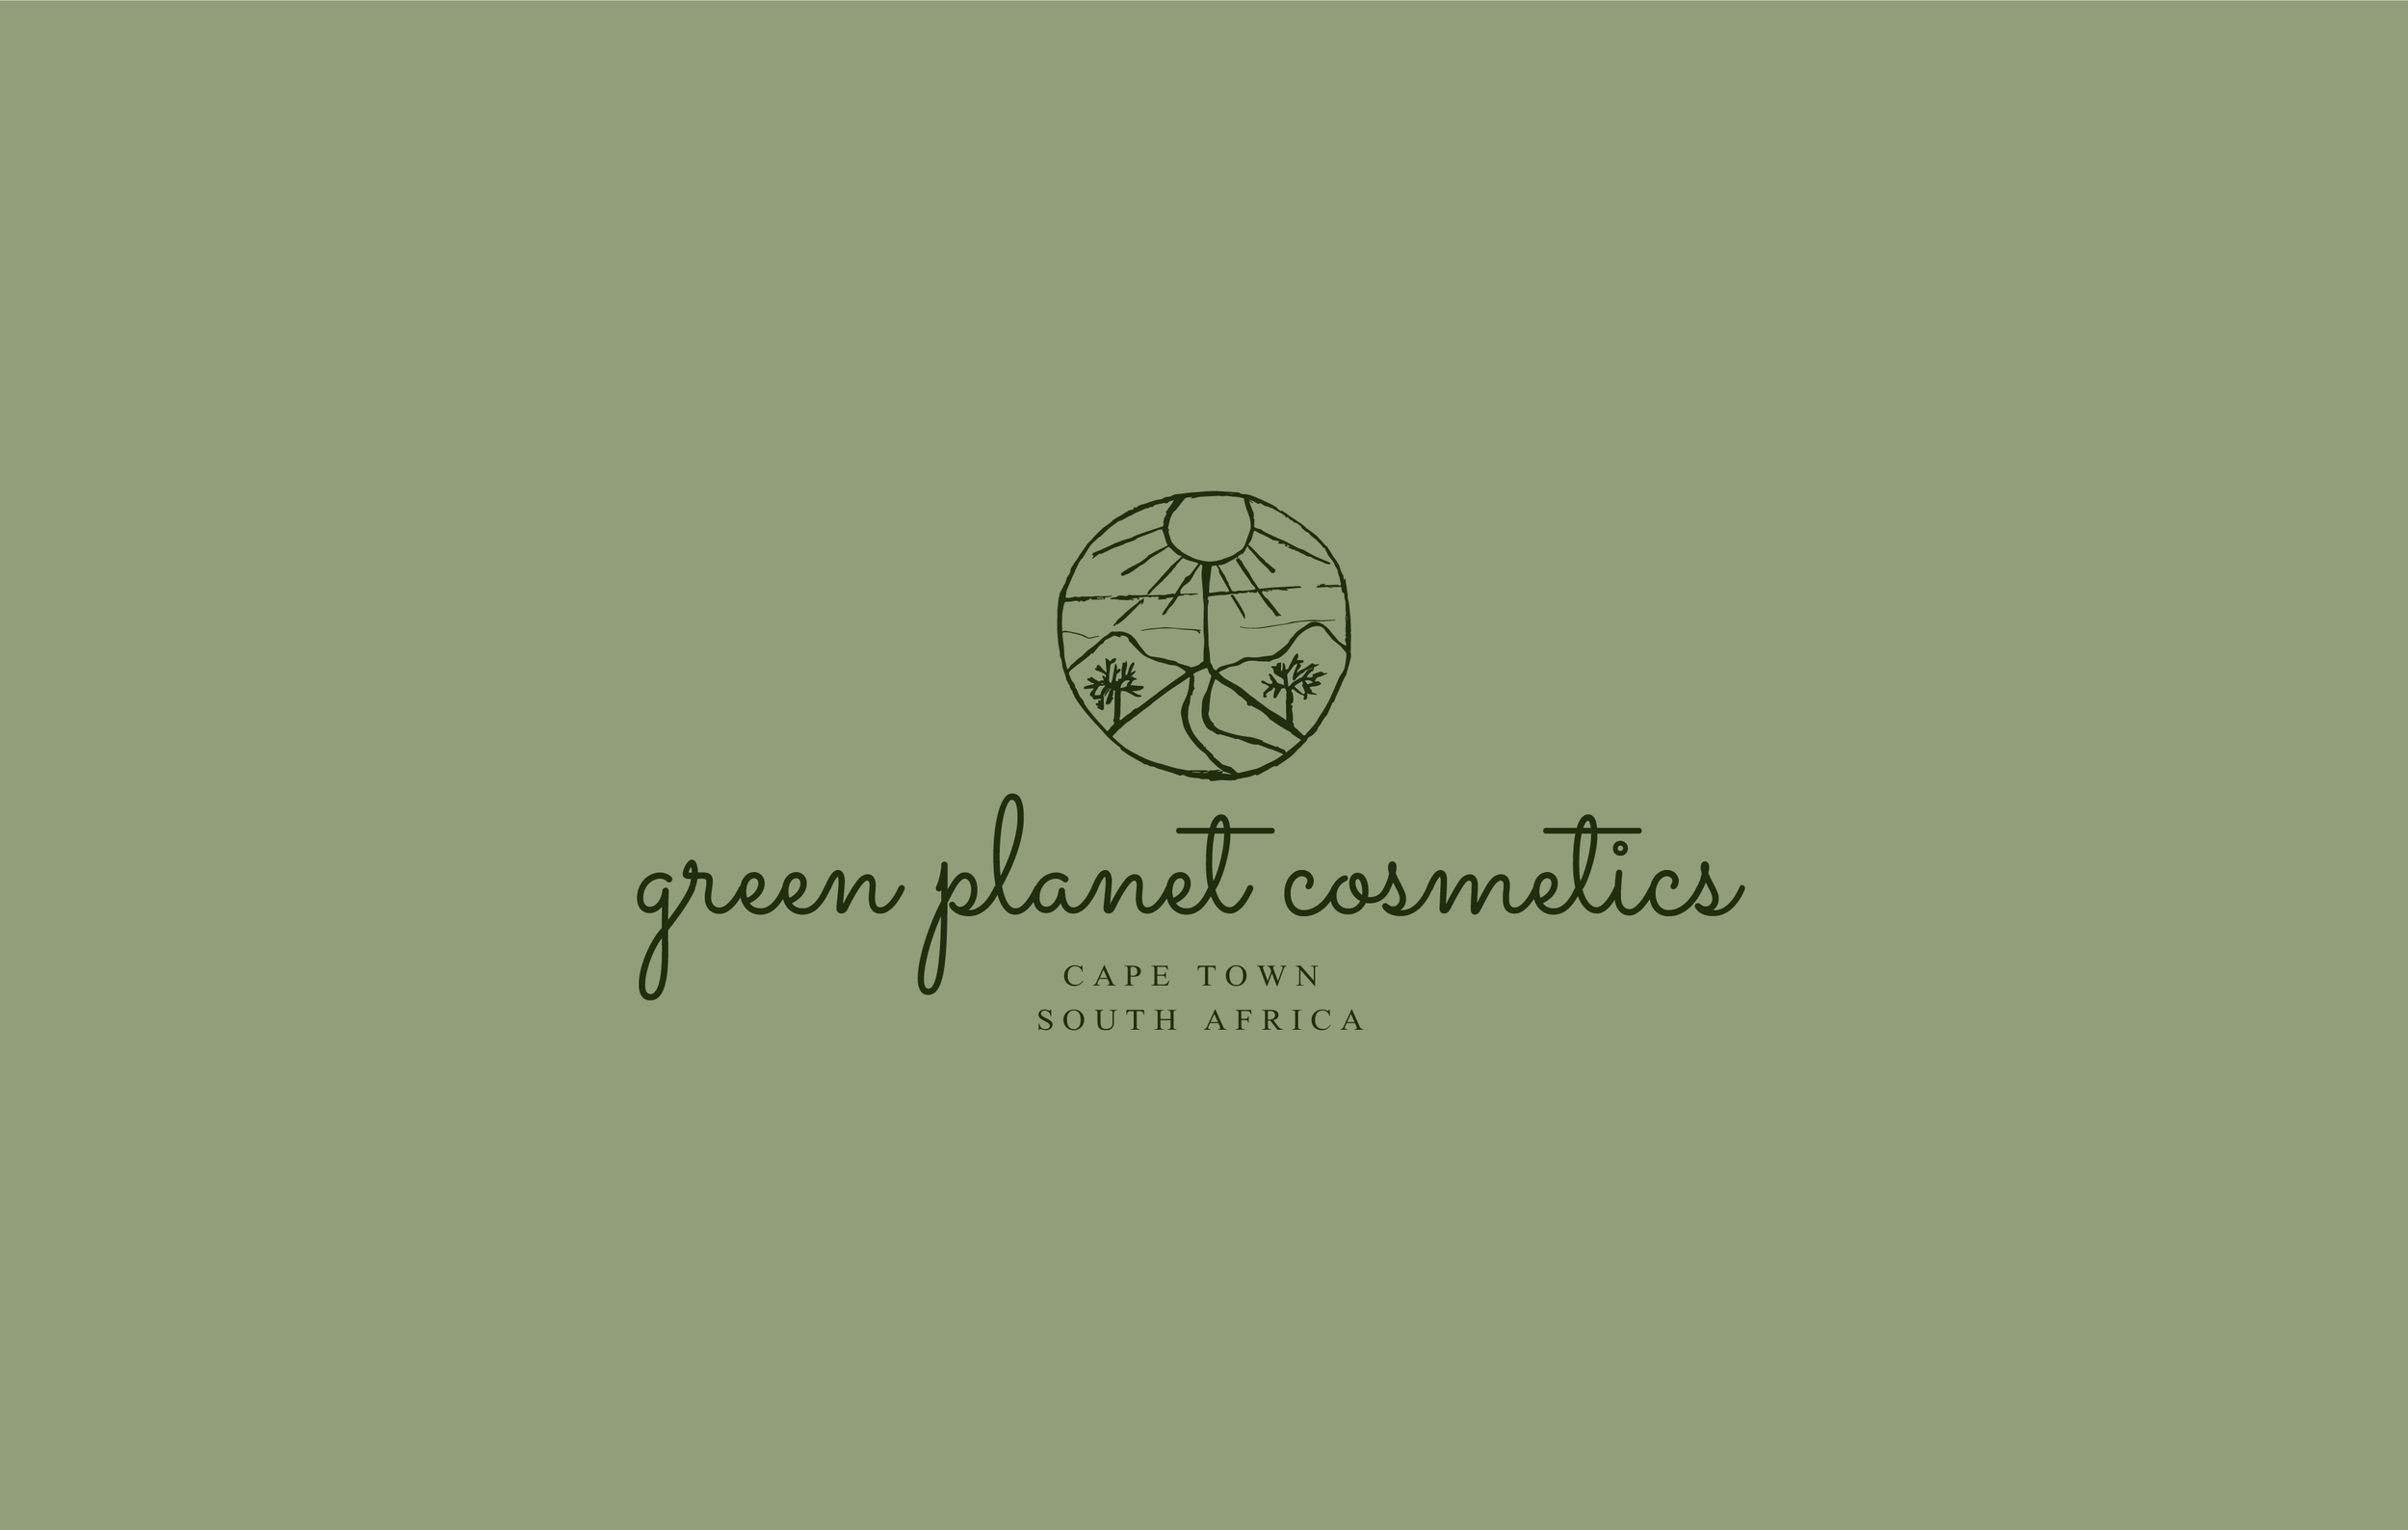 Green planet cosmetics alternative logo